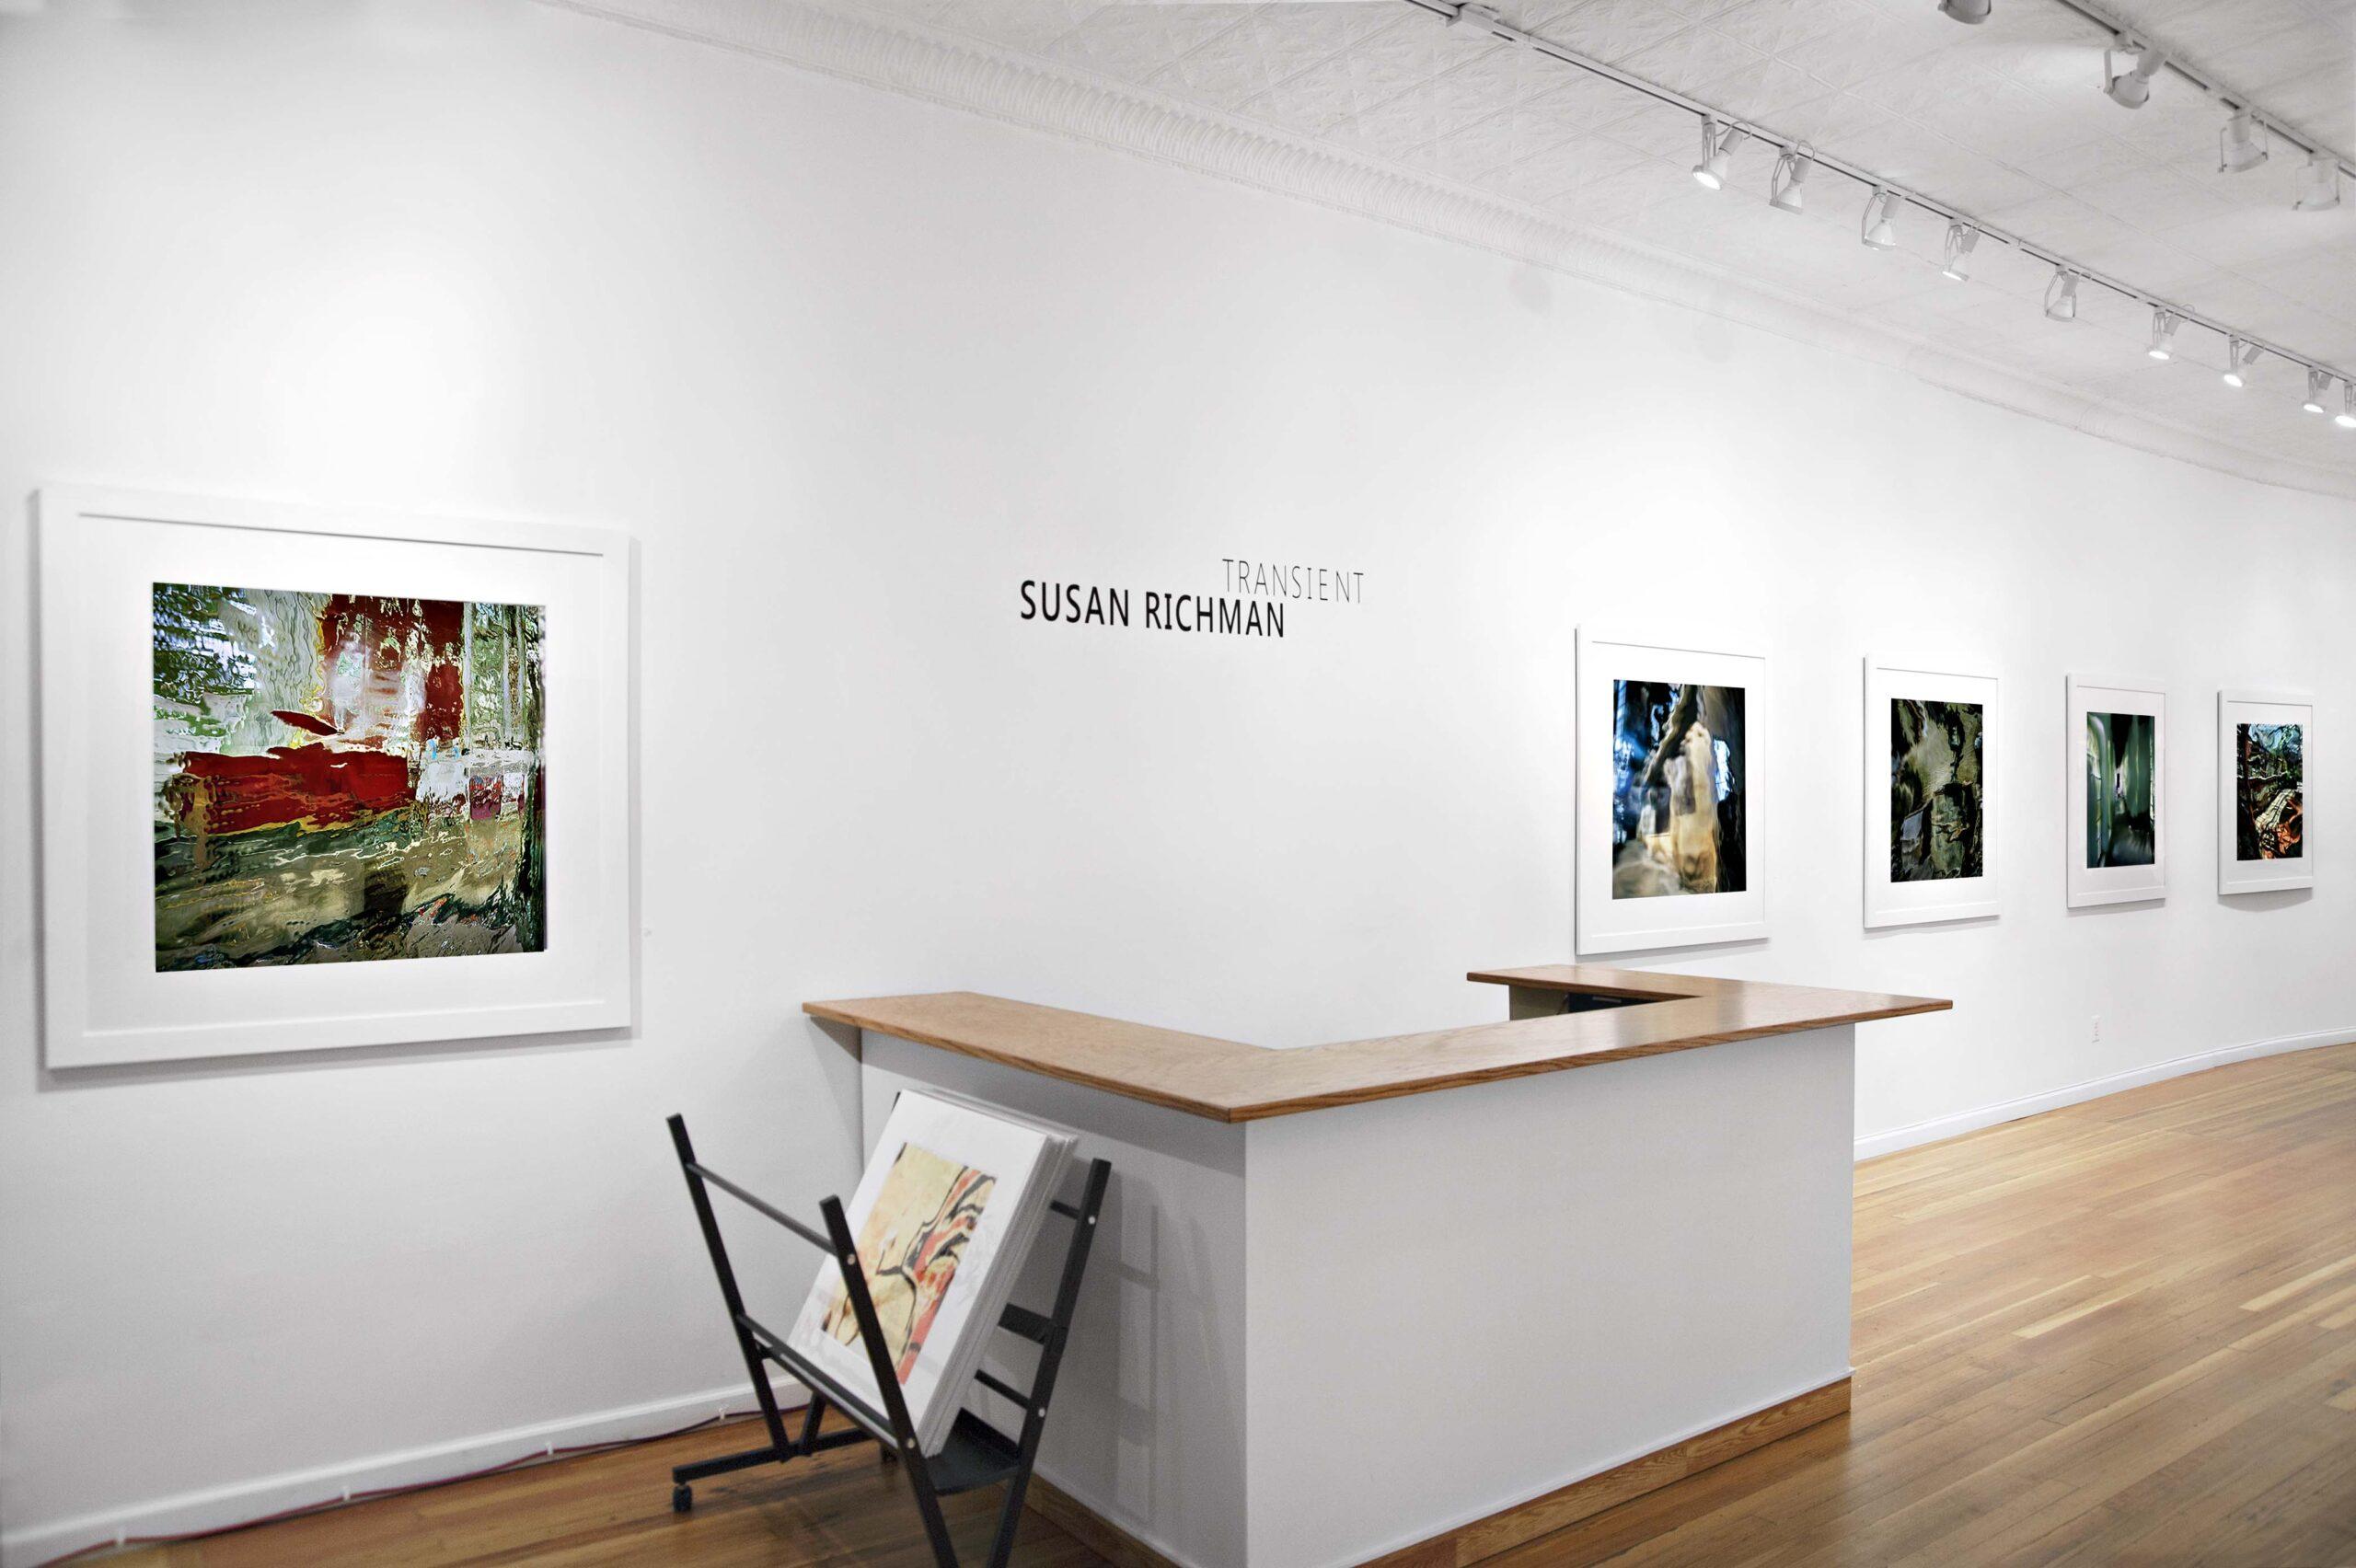 Transient, Upstream Gallery Exhibition View 1